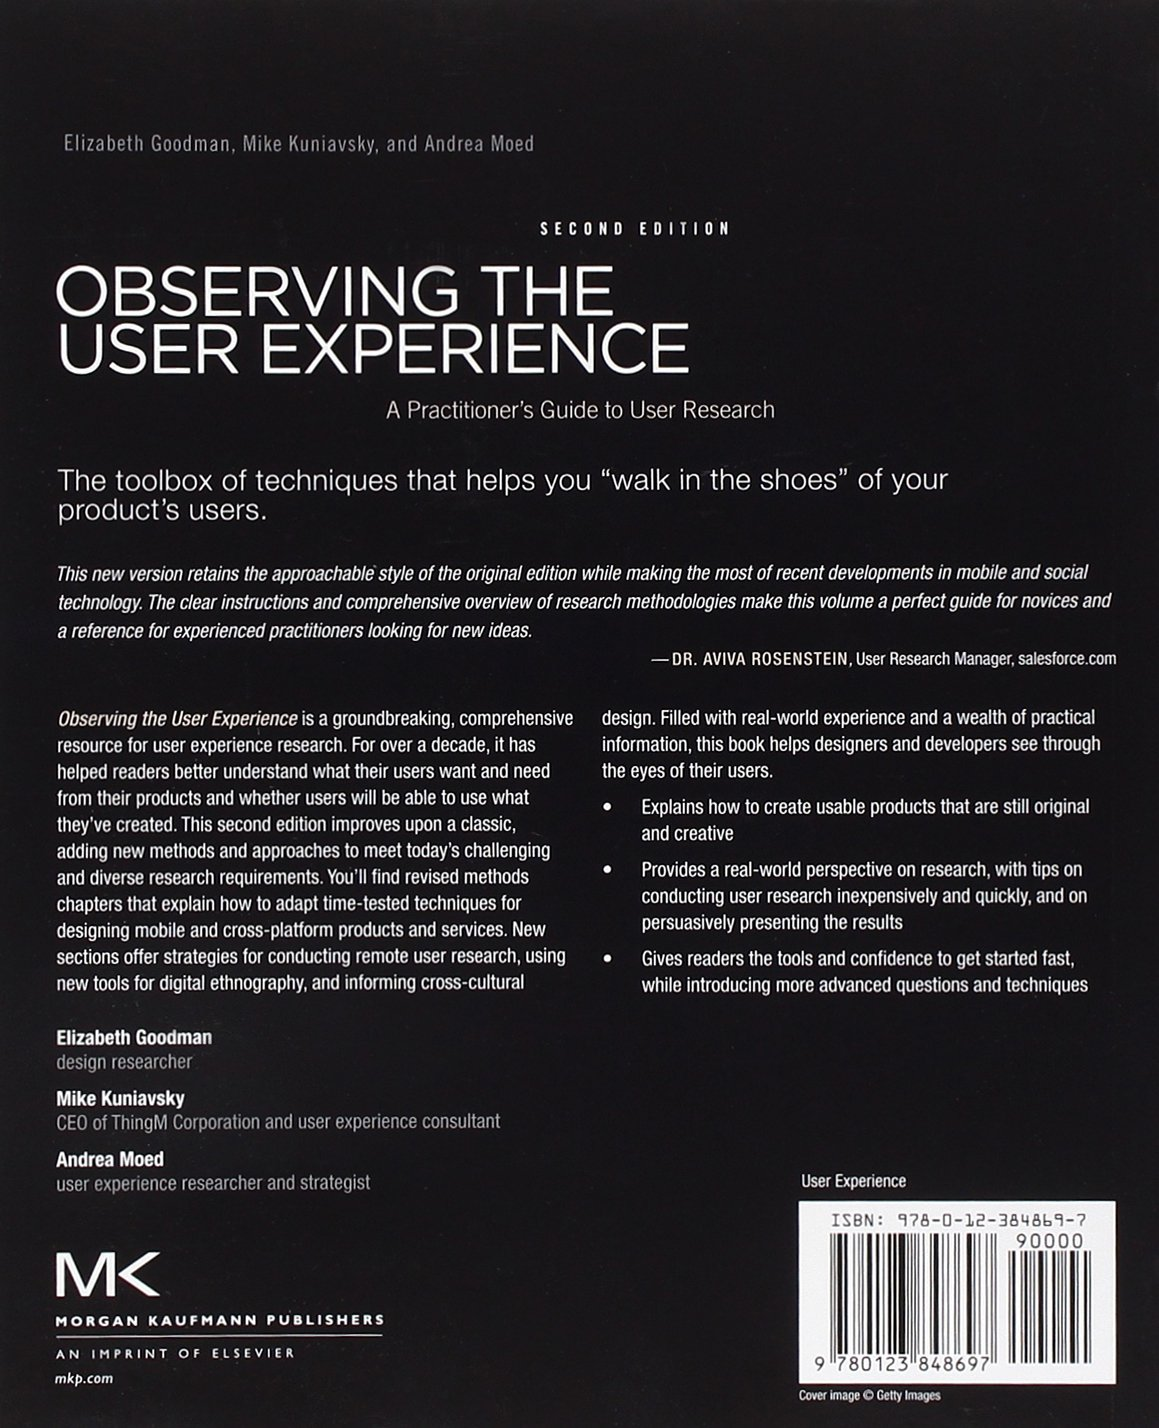 observing the user experience kuniavsky mike goodman elizabeth moed andrea